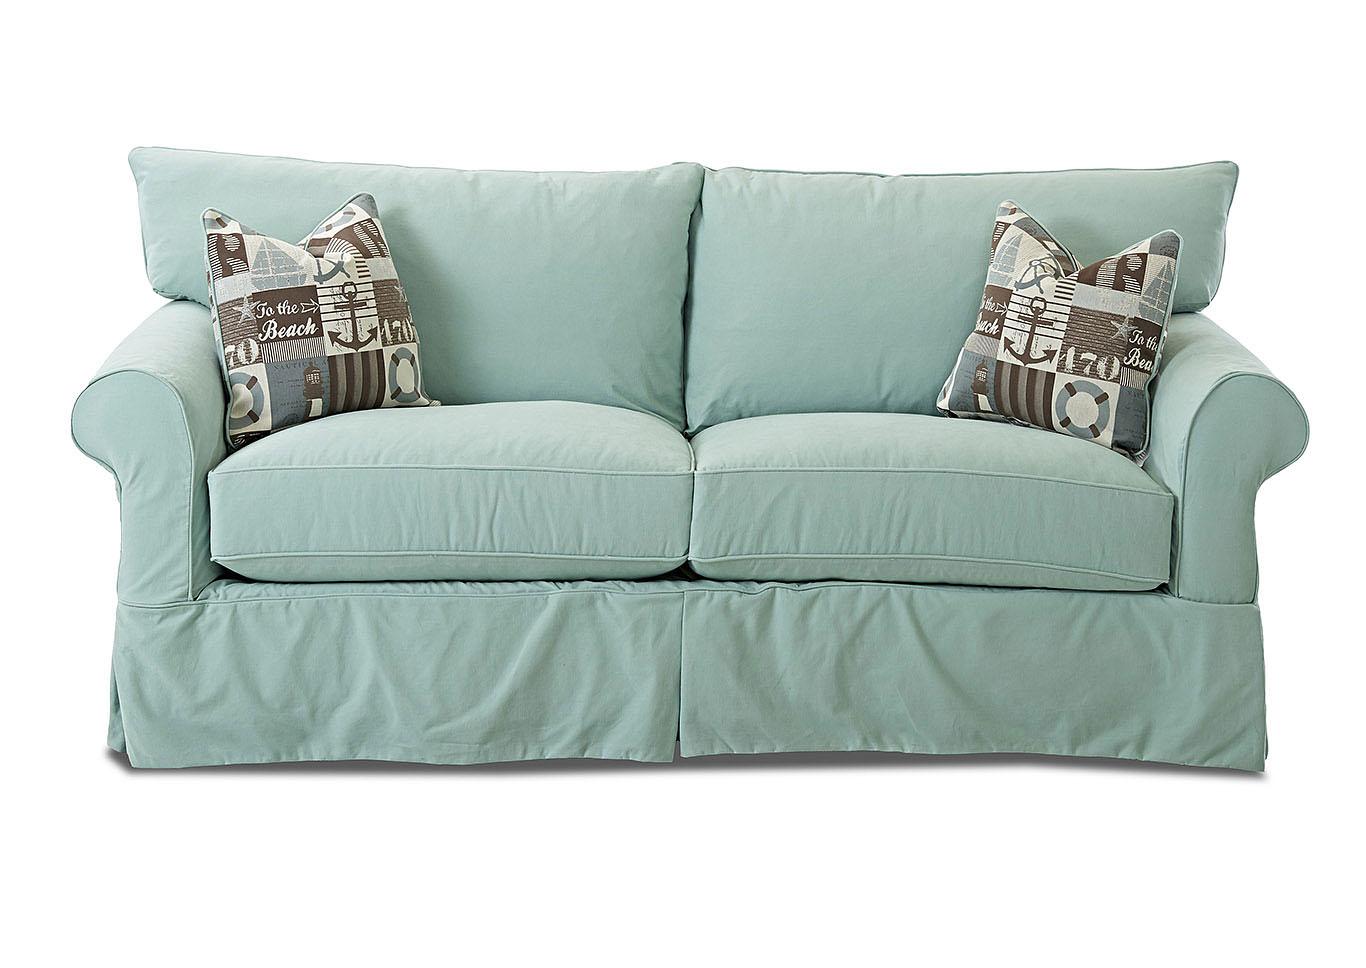 Jenny Bayou Spray Stationary Fabric Sofa,Klaussner Home Furnishings